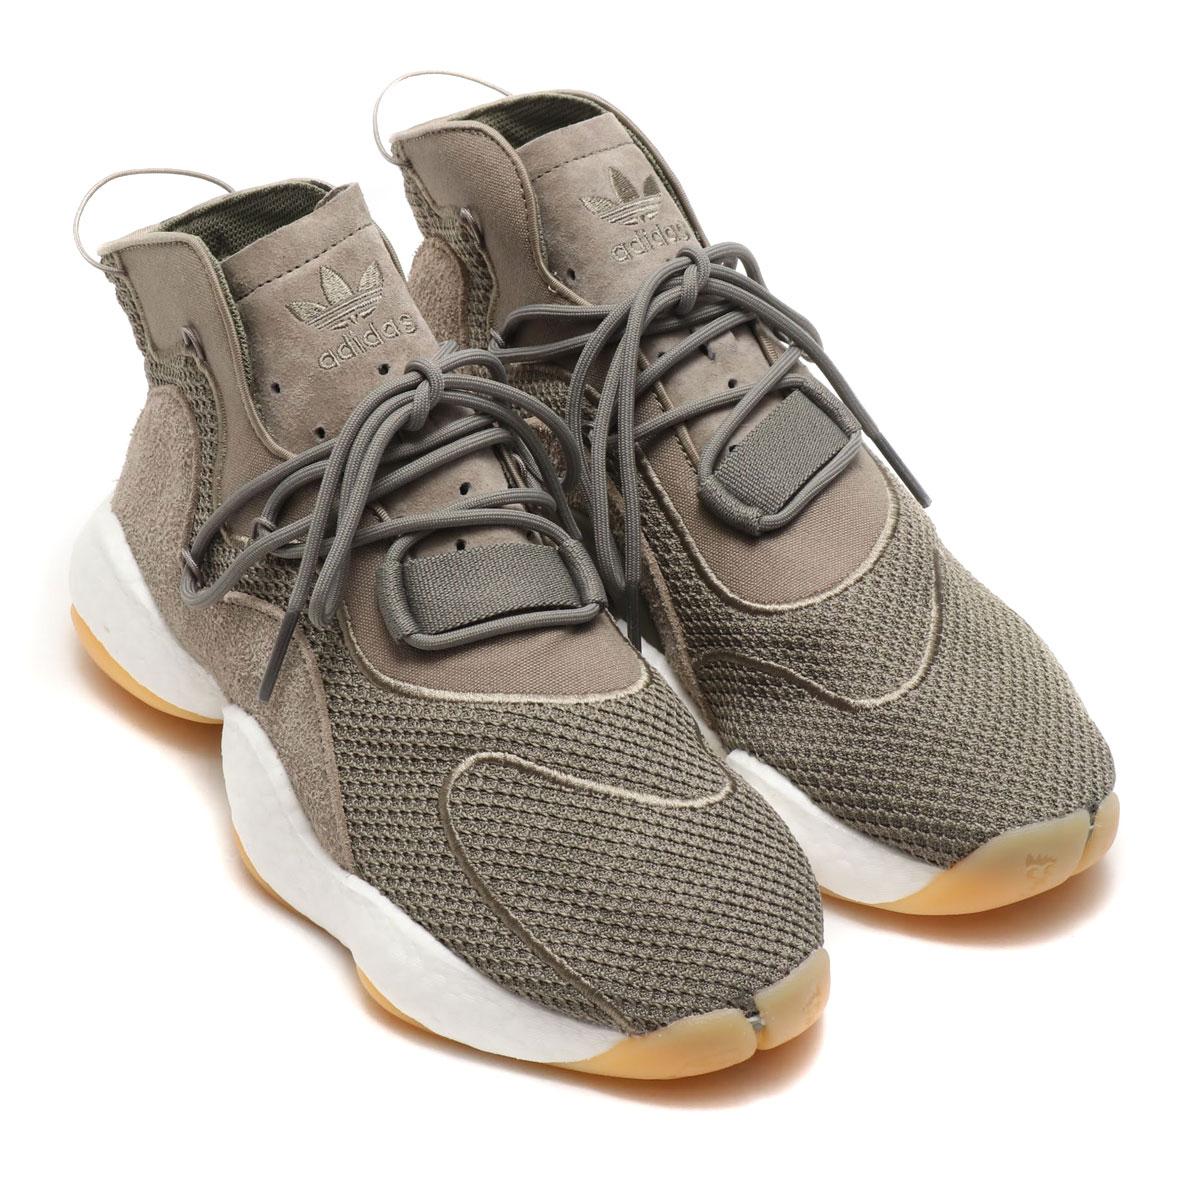 adidas Originals CRAZY BYW LVL I(アディダスオリジナルス クレイジー BYW LVL I)TRACE CARGO/RAW KHAKI/GUM16【メンズ スニーカー】19SS-I